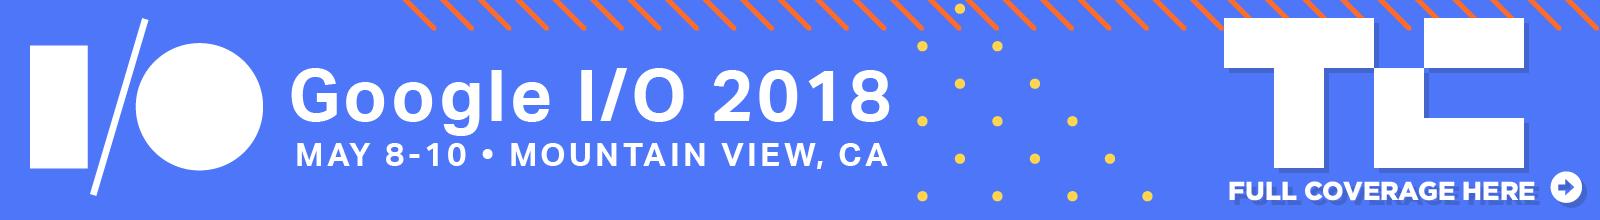 google io 2018 banne 12